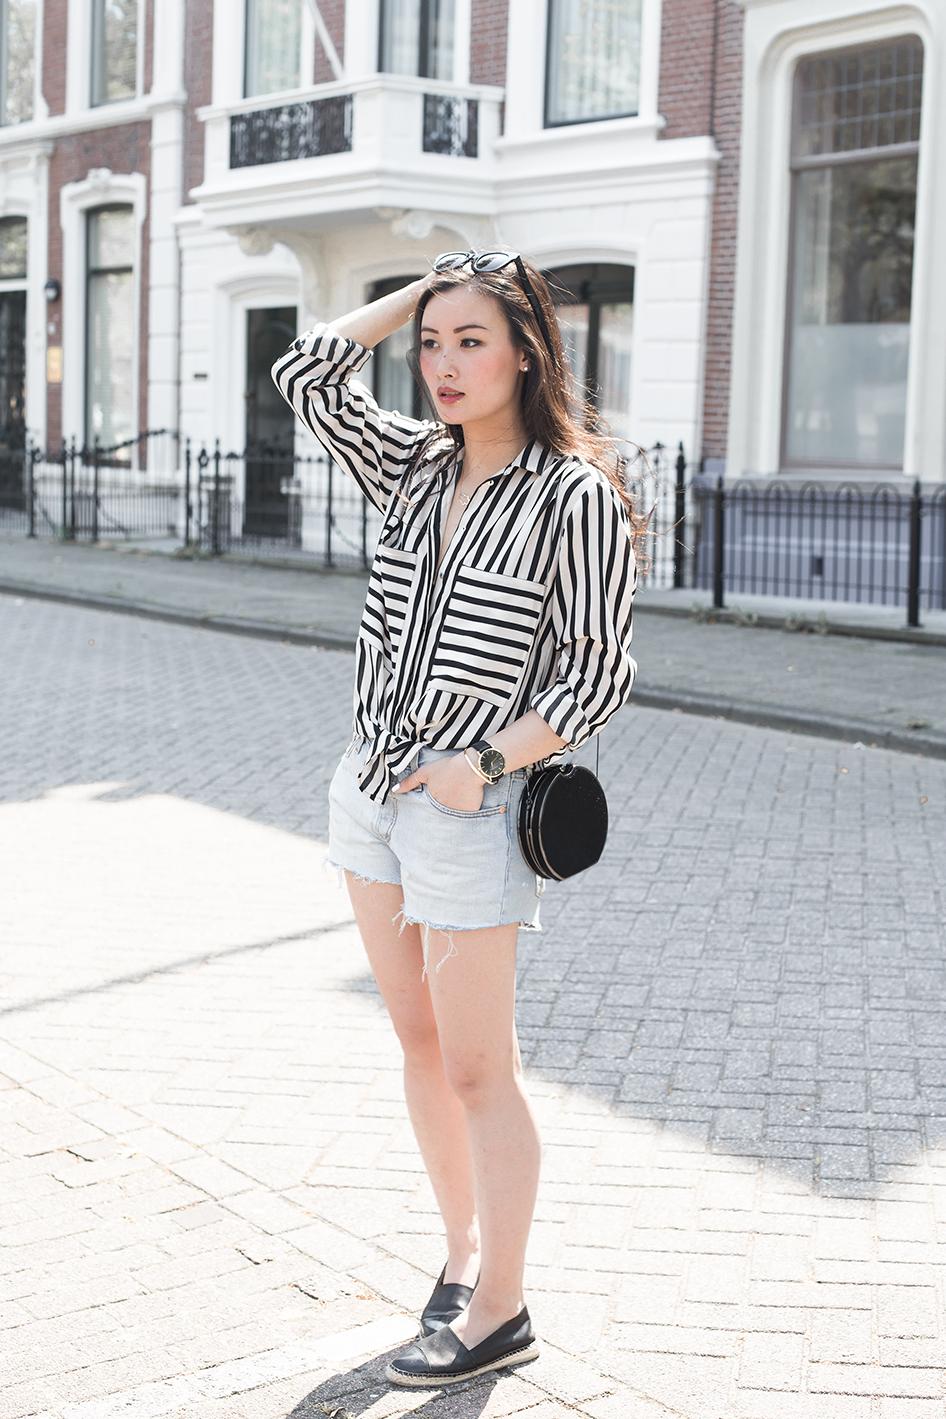 levi nguyen tlnique blogspot wearing black white striped shirt with denim shorts